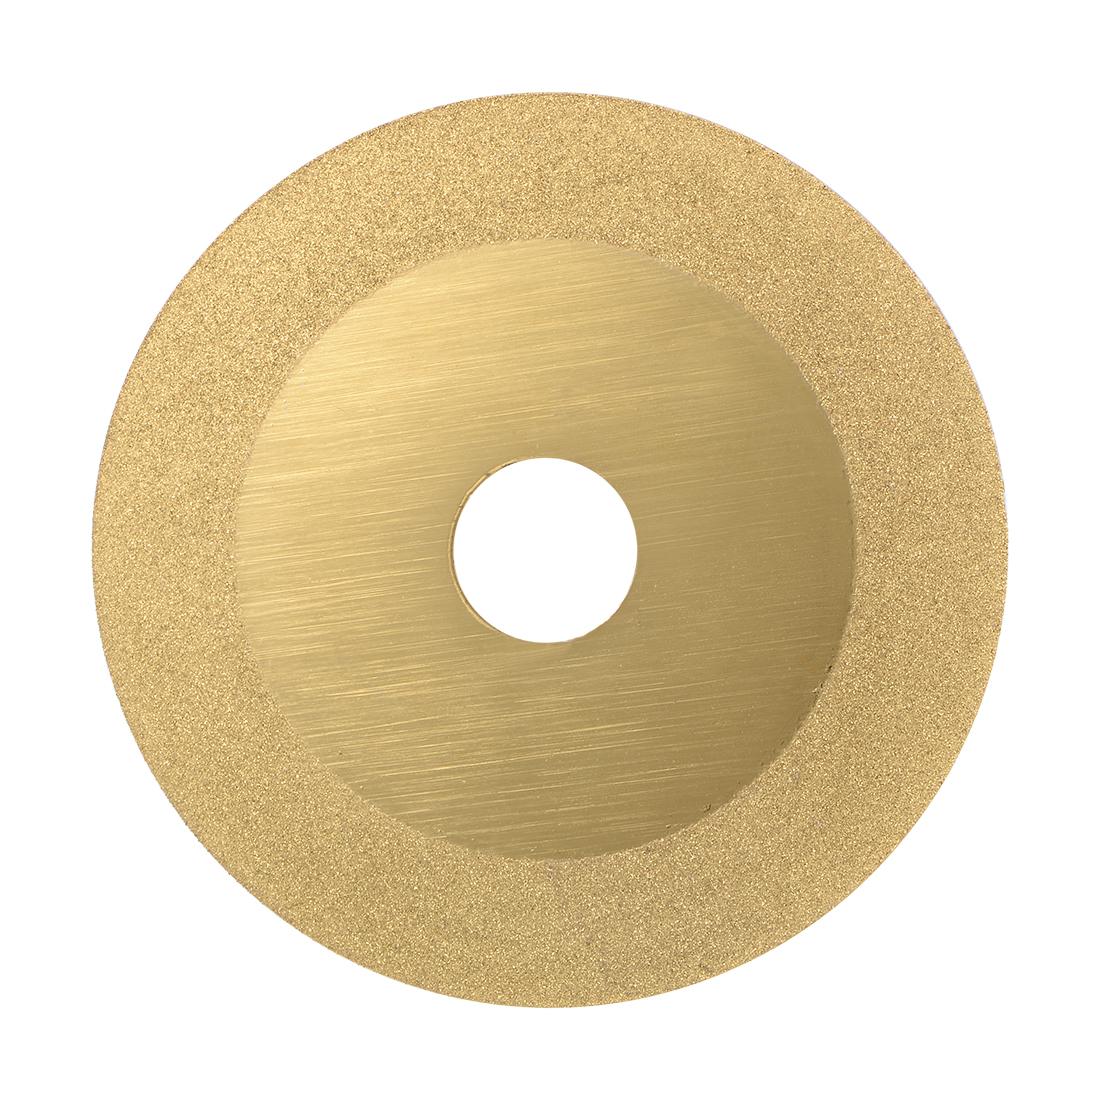 "Diamond Grinding Disc 4"" Marble Stone Grind Wheel 120-150 Grit"